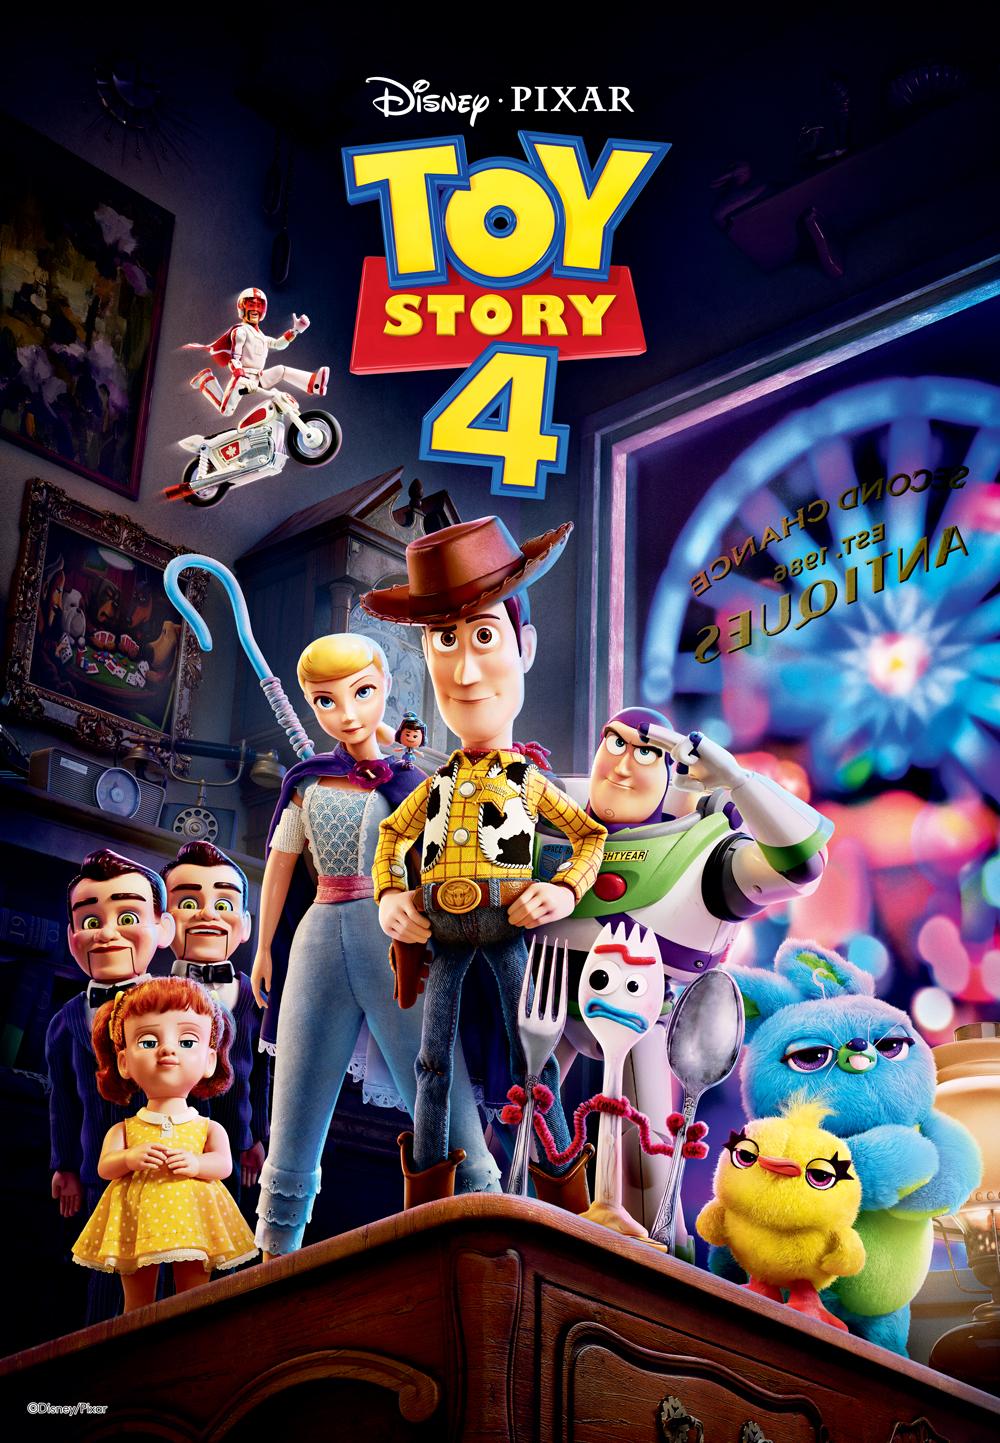 [Disney] 디즈니 토이스토리4 직소퍼즐(1000피스/D1010) - 퍼즐라이프, 22,000원, 조각/퍼즐, 영화 직소퍼즐